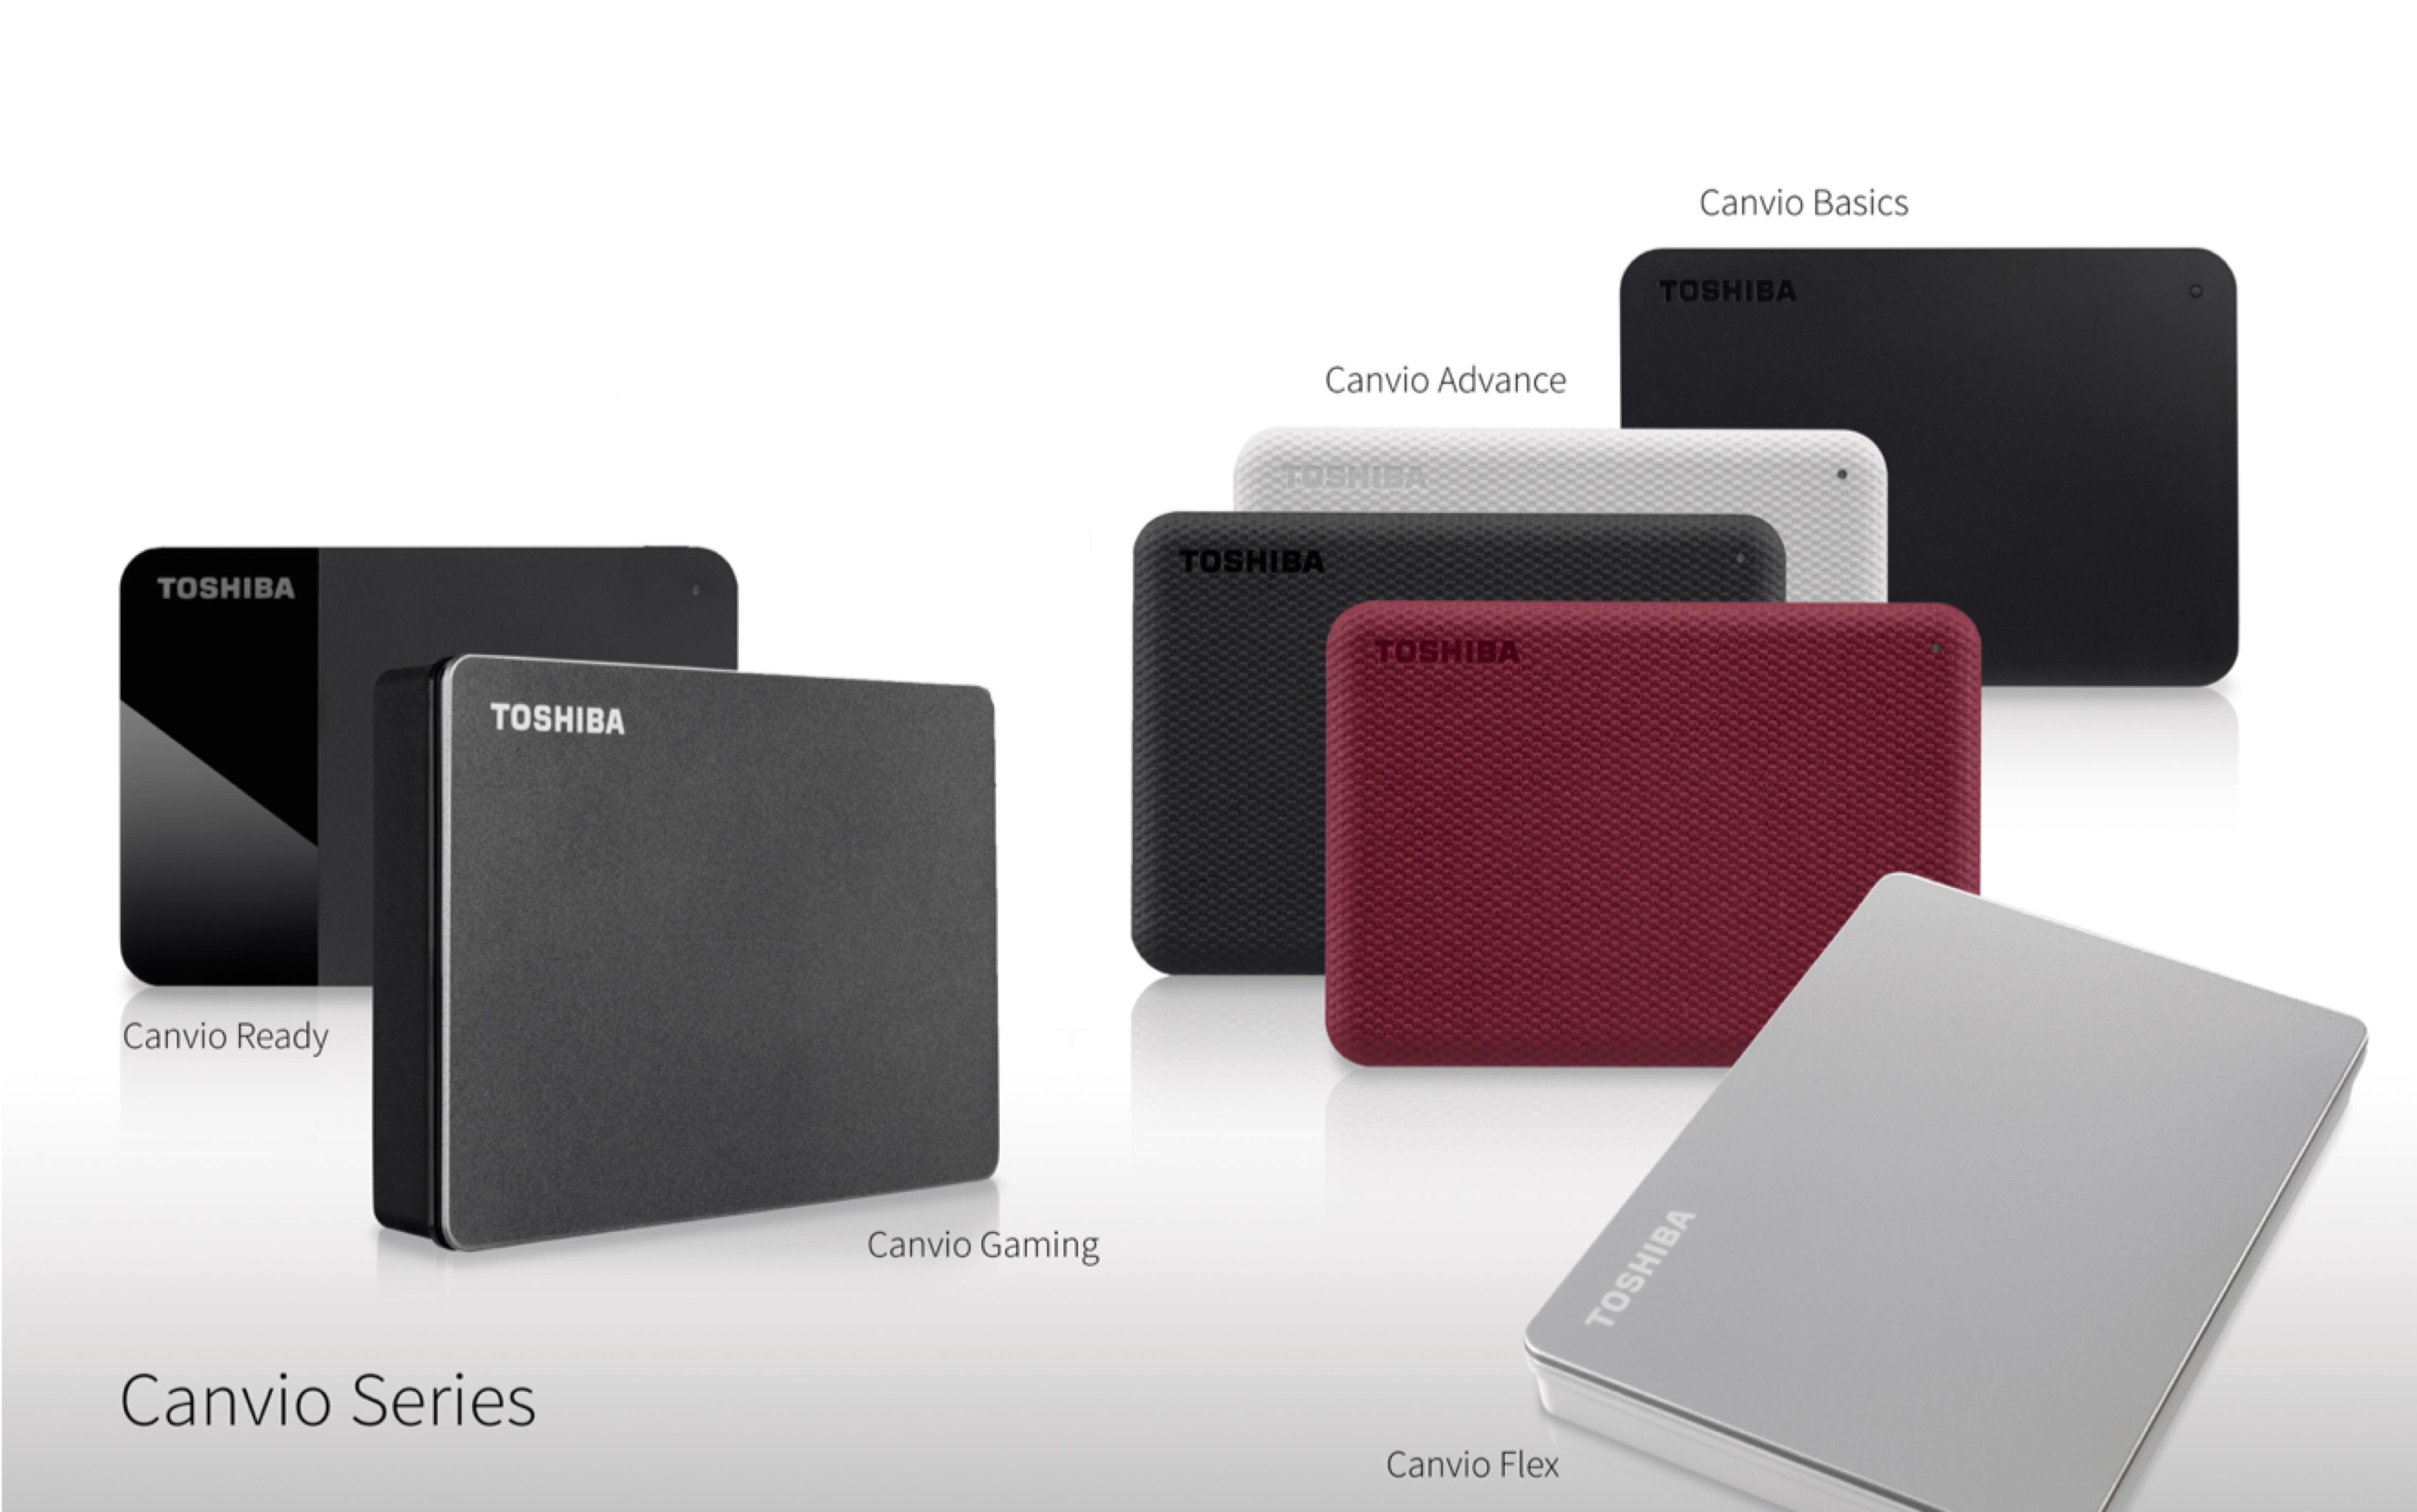 TOSHIBA Canvio系列外接儲存裝置再添生力軍 發表全新外型設計與應用軟體